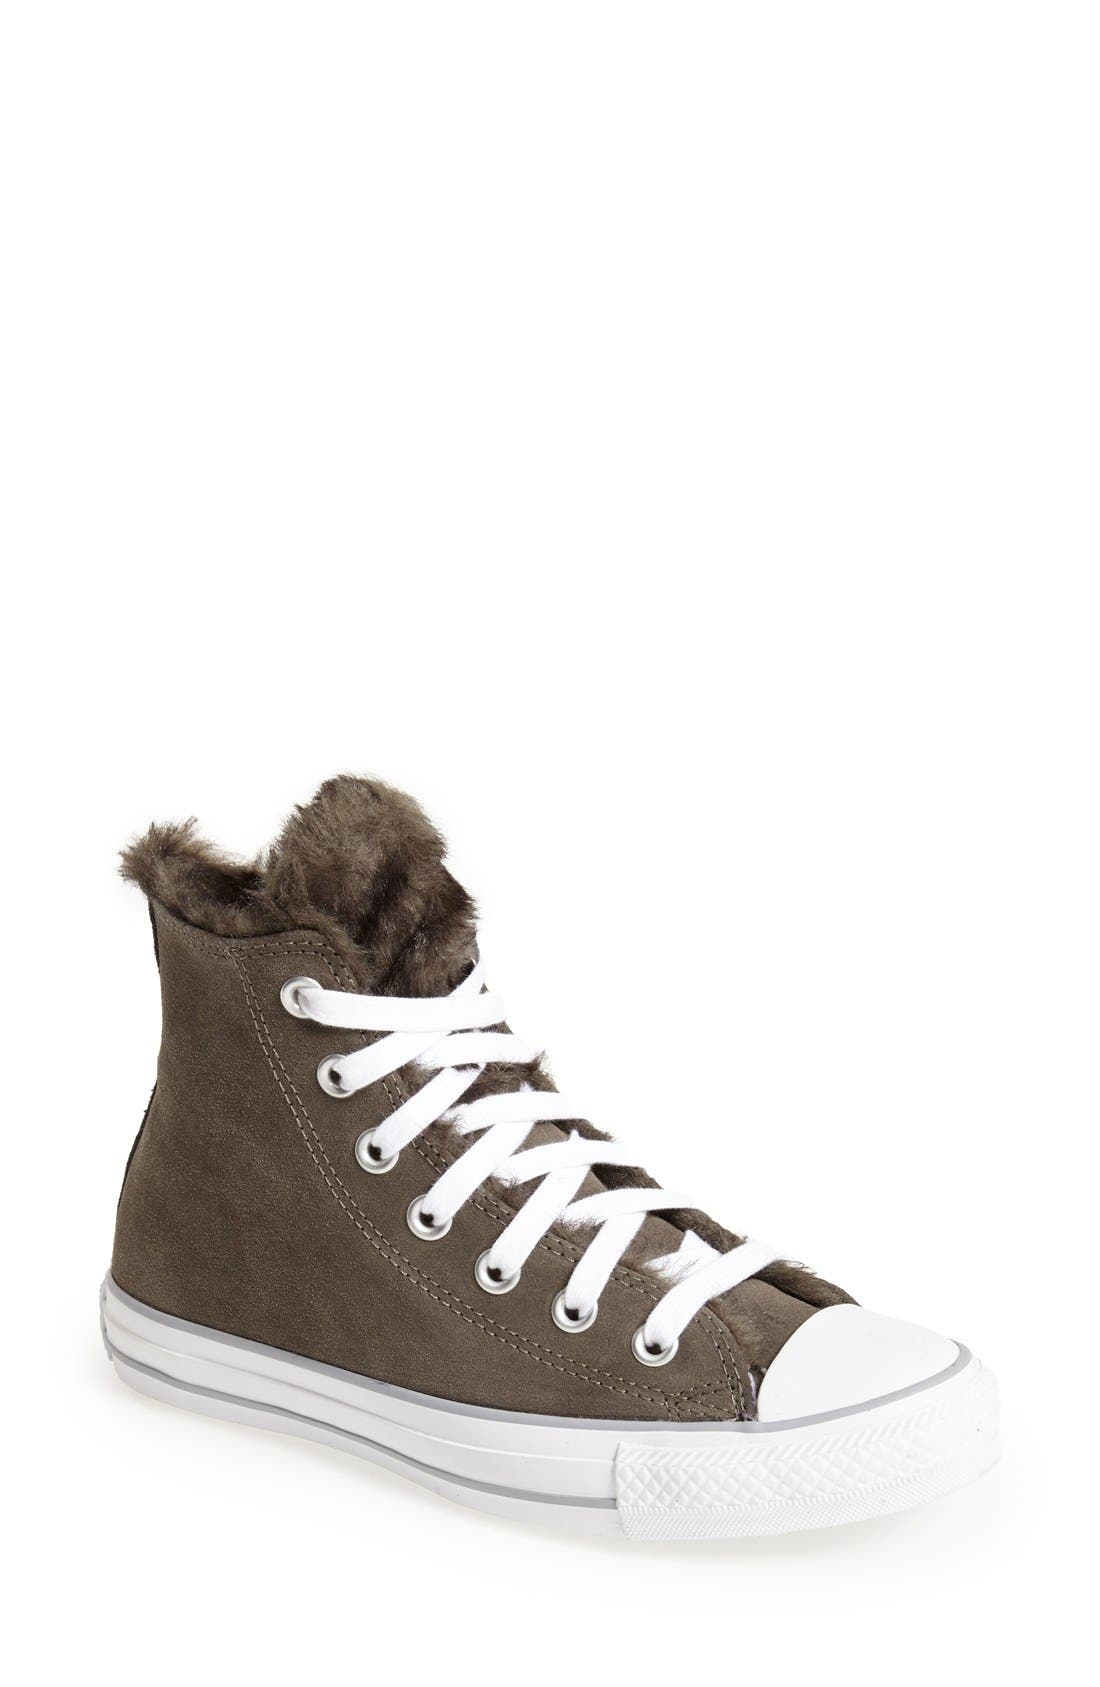 Main Image - Converse Chuck Taylor® All Star® 'Fun Fur' High-Top Sneaker (Women)